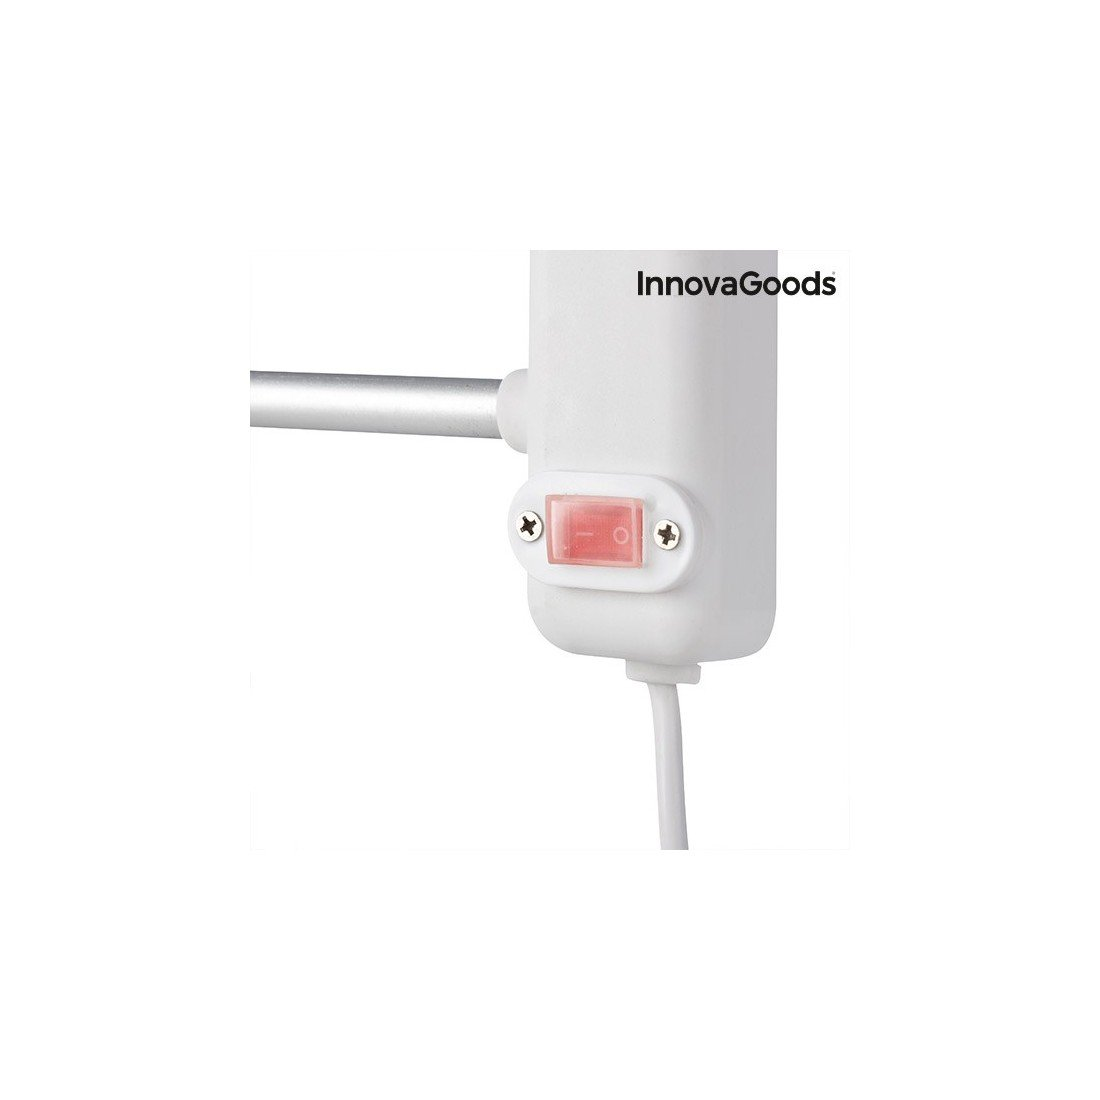 InnovaGoods Handtuchhalter Wand 60/x 43/x 4/cm wei/ß//grau Aluminium und ABS